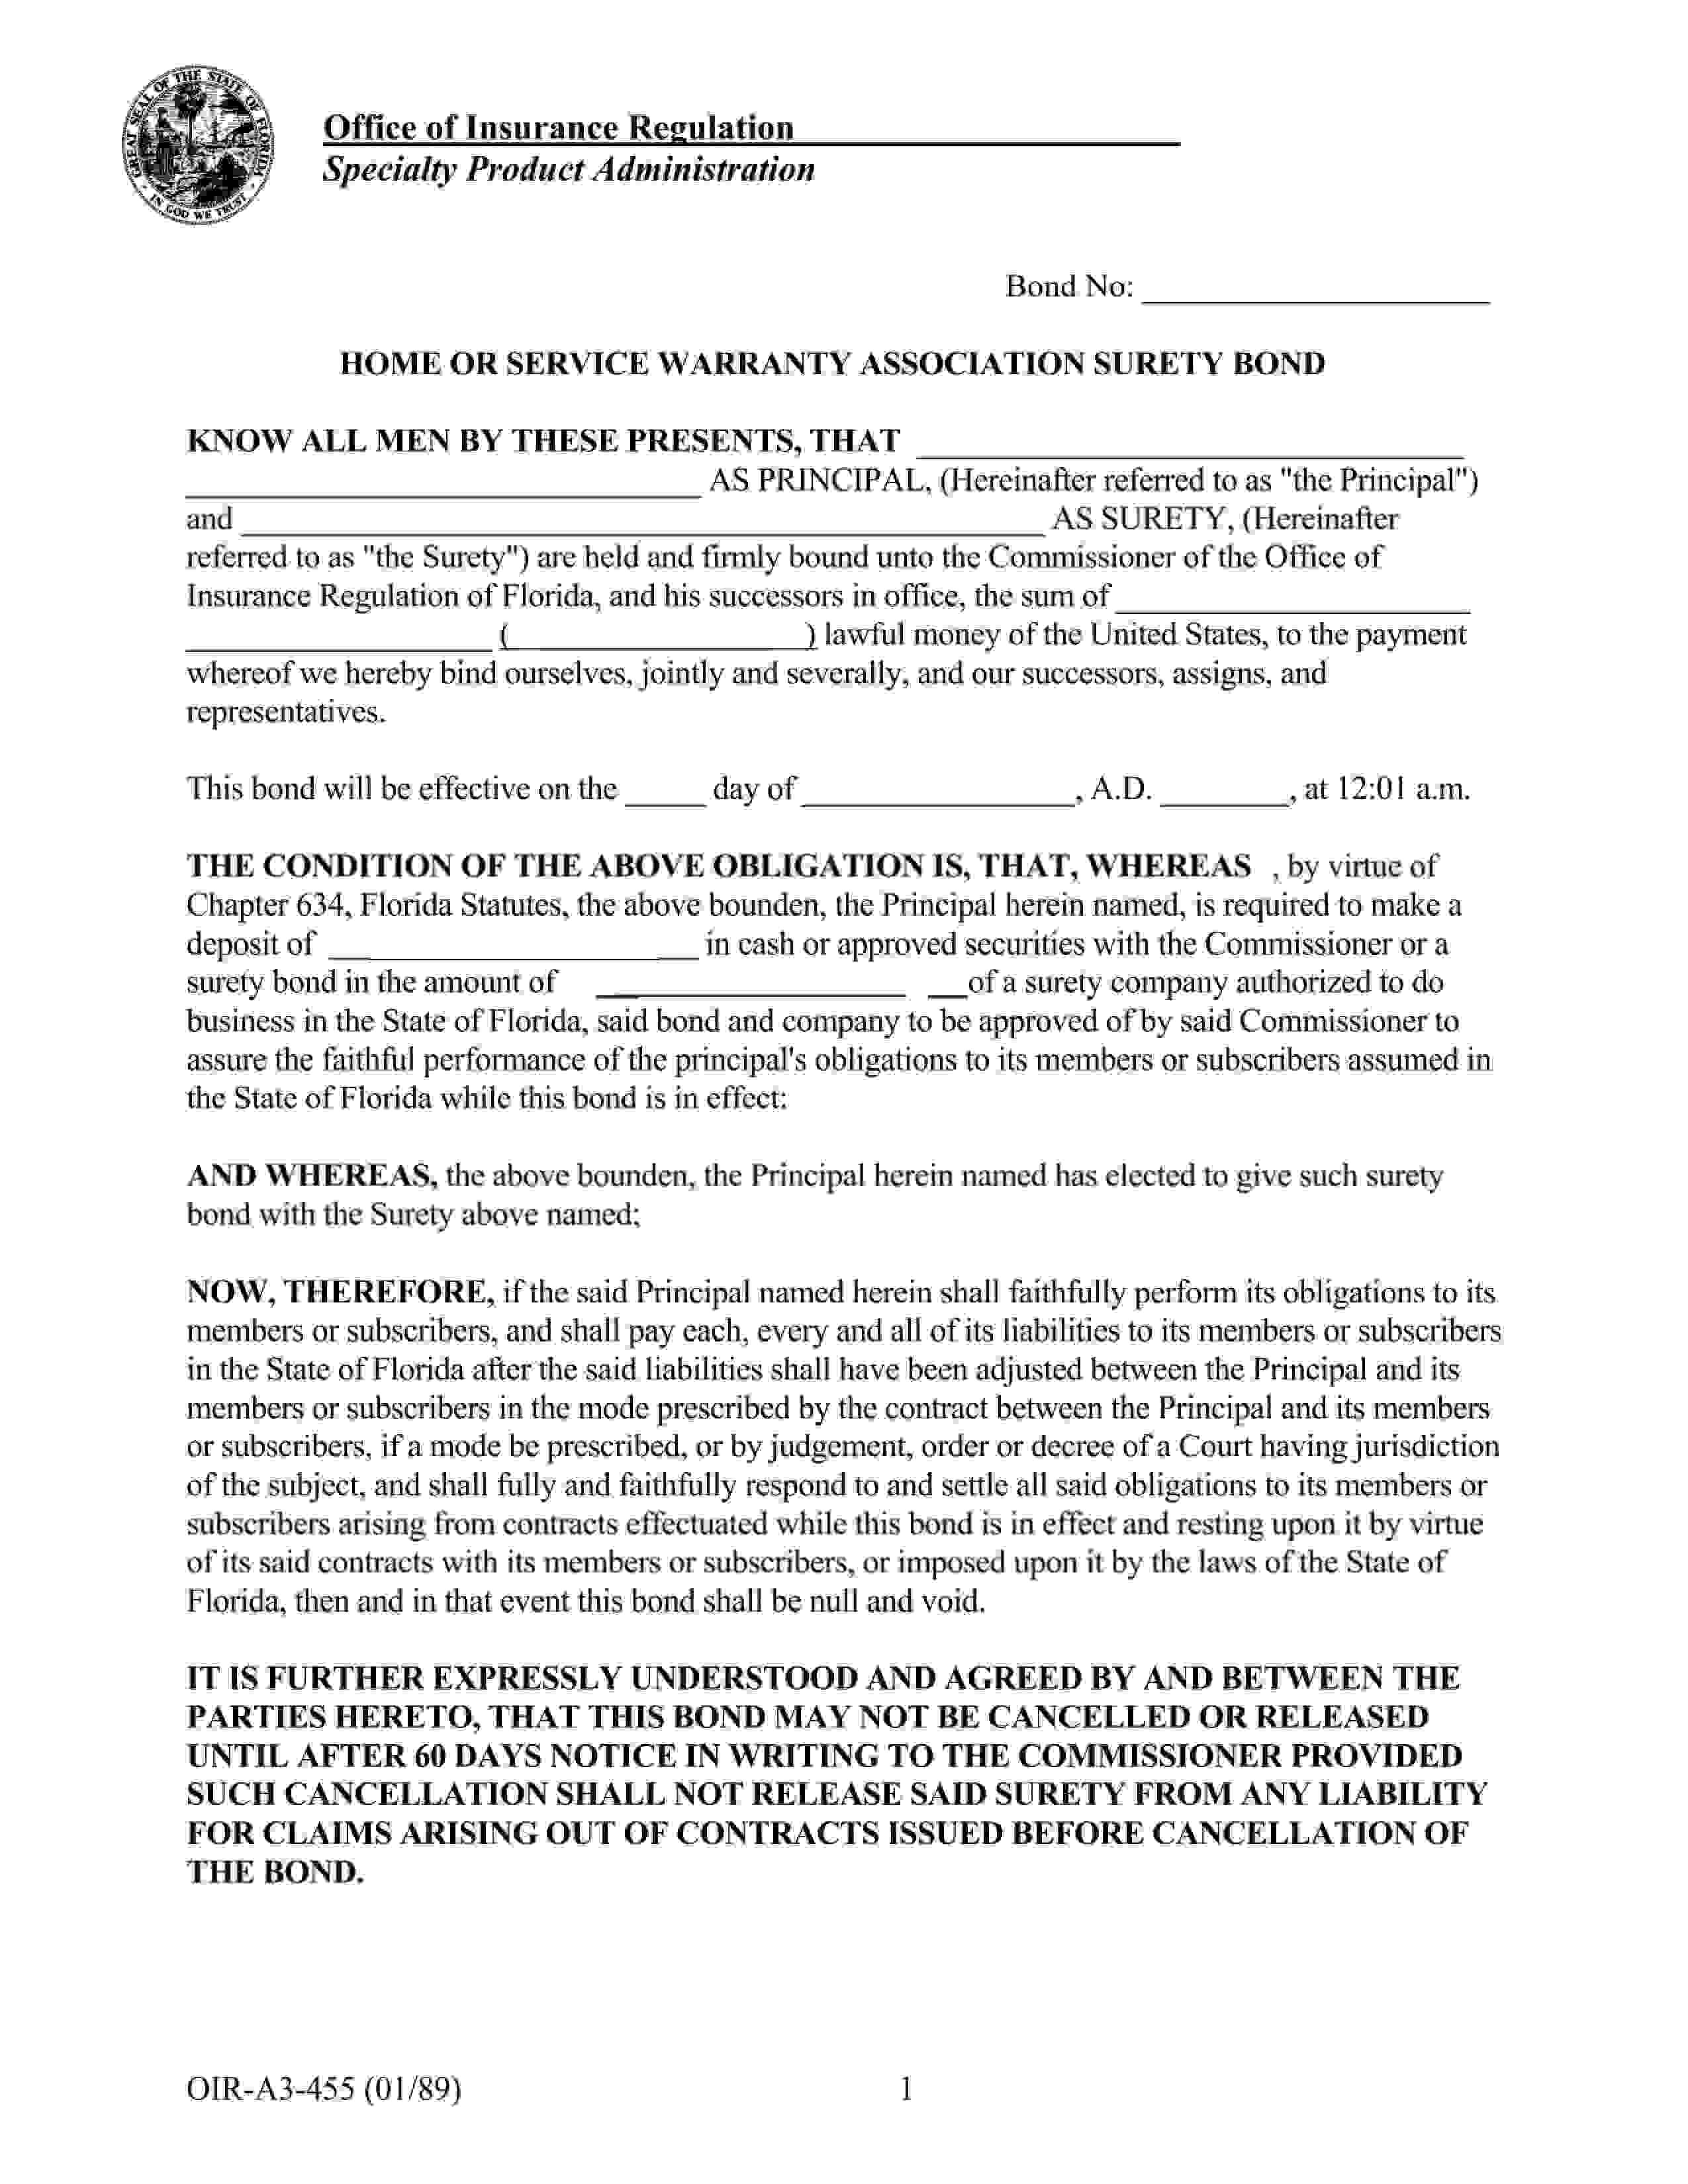 Commissioner of the Office of Insurance Regulation of Florida Home or Service Warranty Association Bond sample image